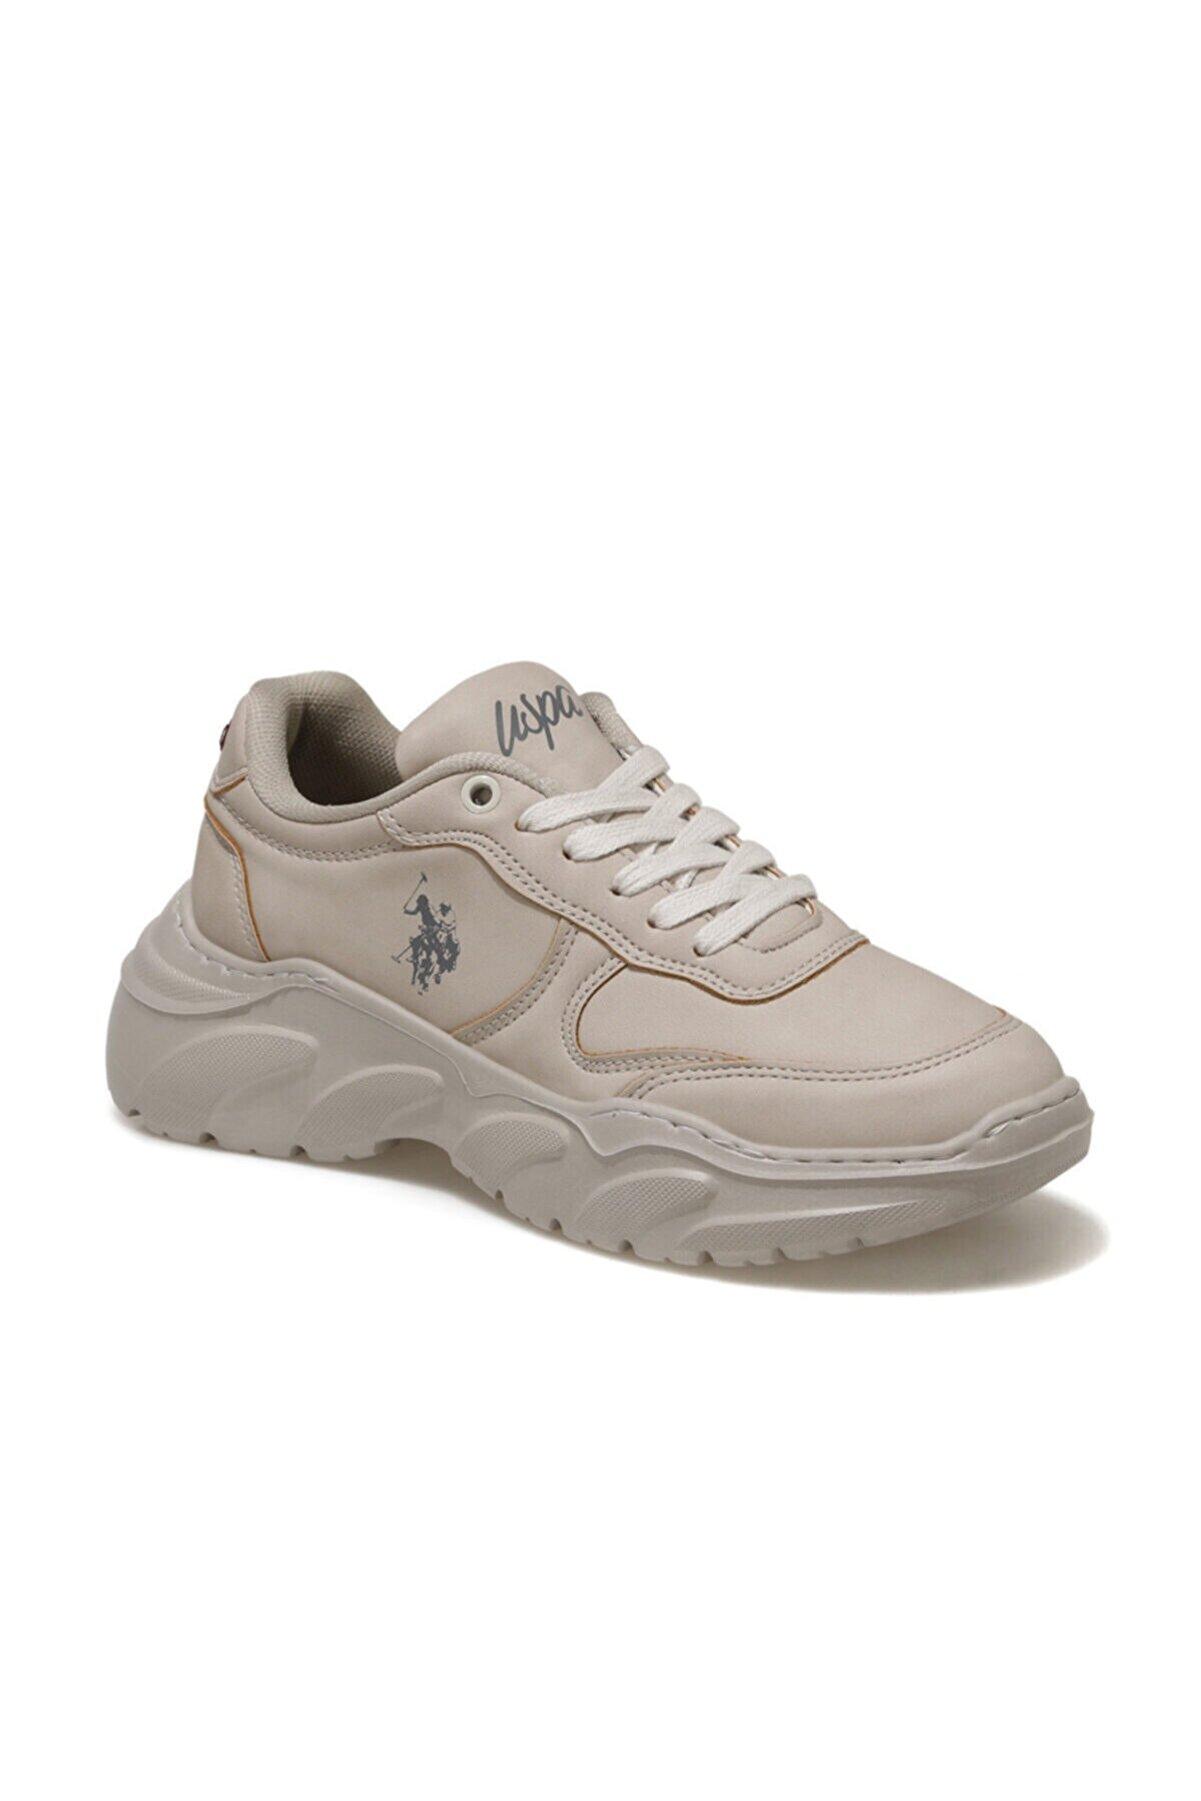 US Polo Assn LOVELY Bej Kadın Fashion Sneaker 100551395